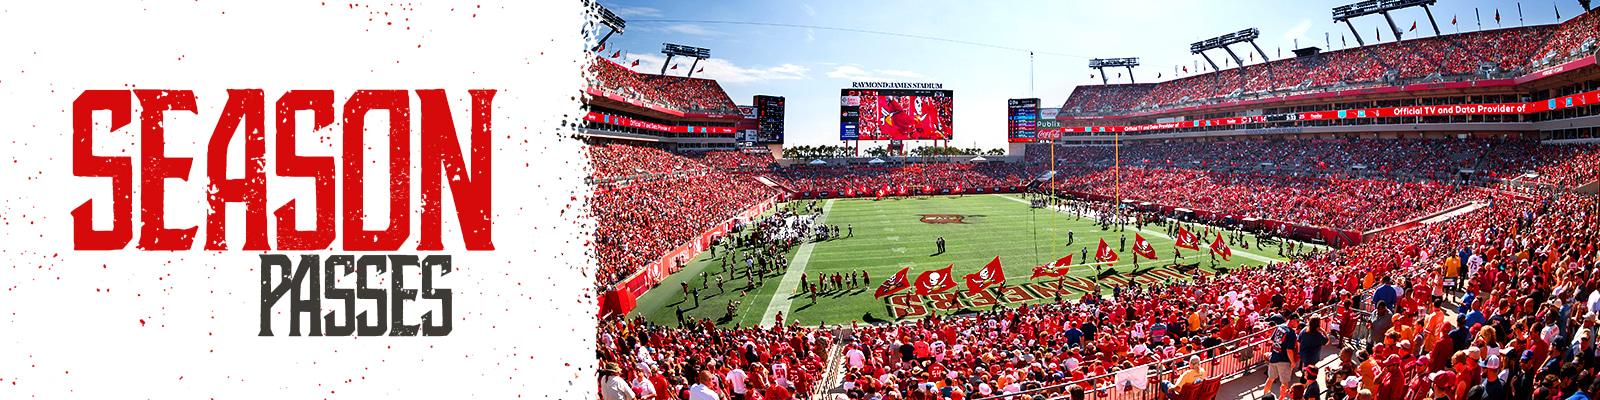 Tampa Bay Buccaneers Home Schedule 2020.Official Site Of The Tampa Bay Buccaneers